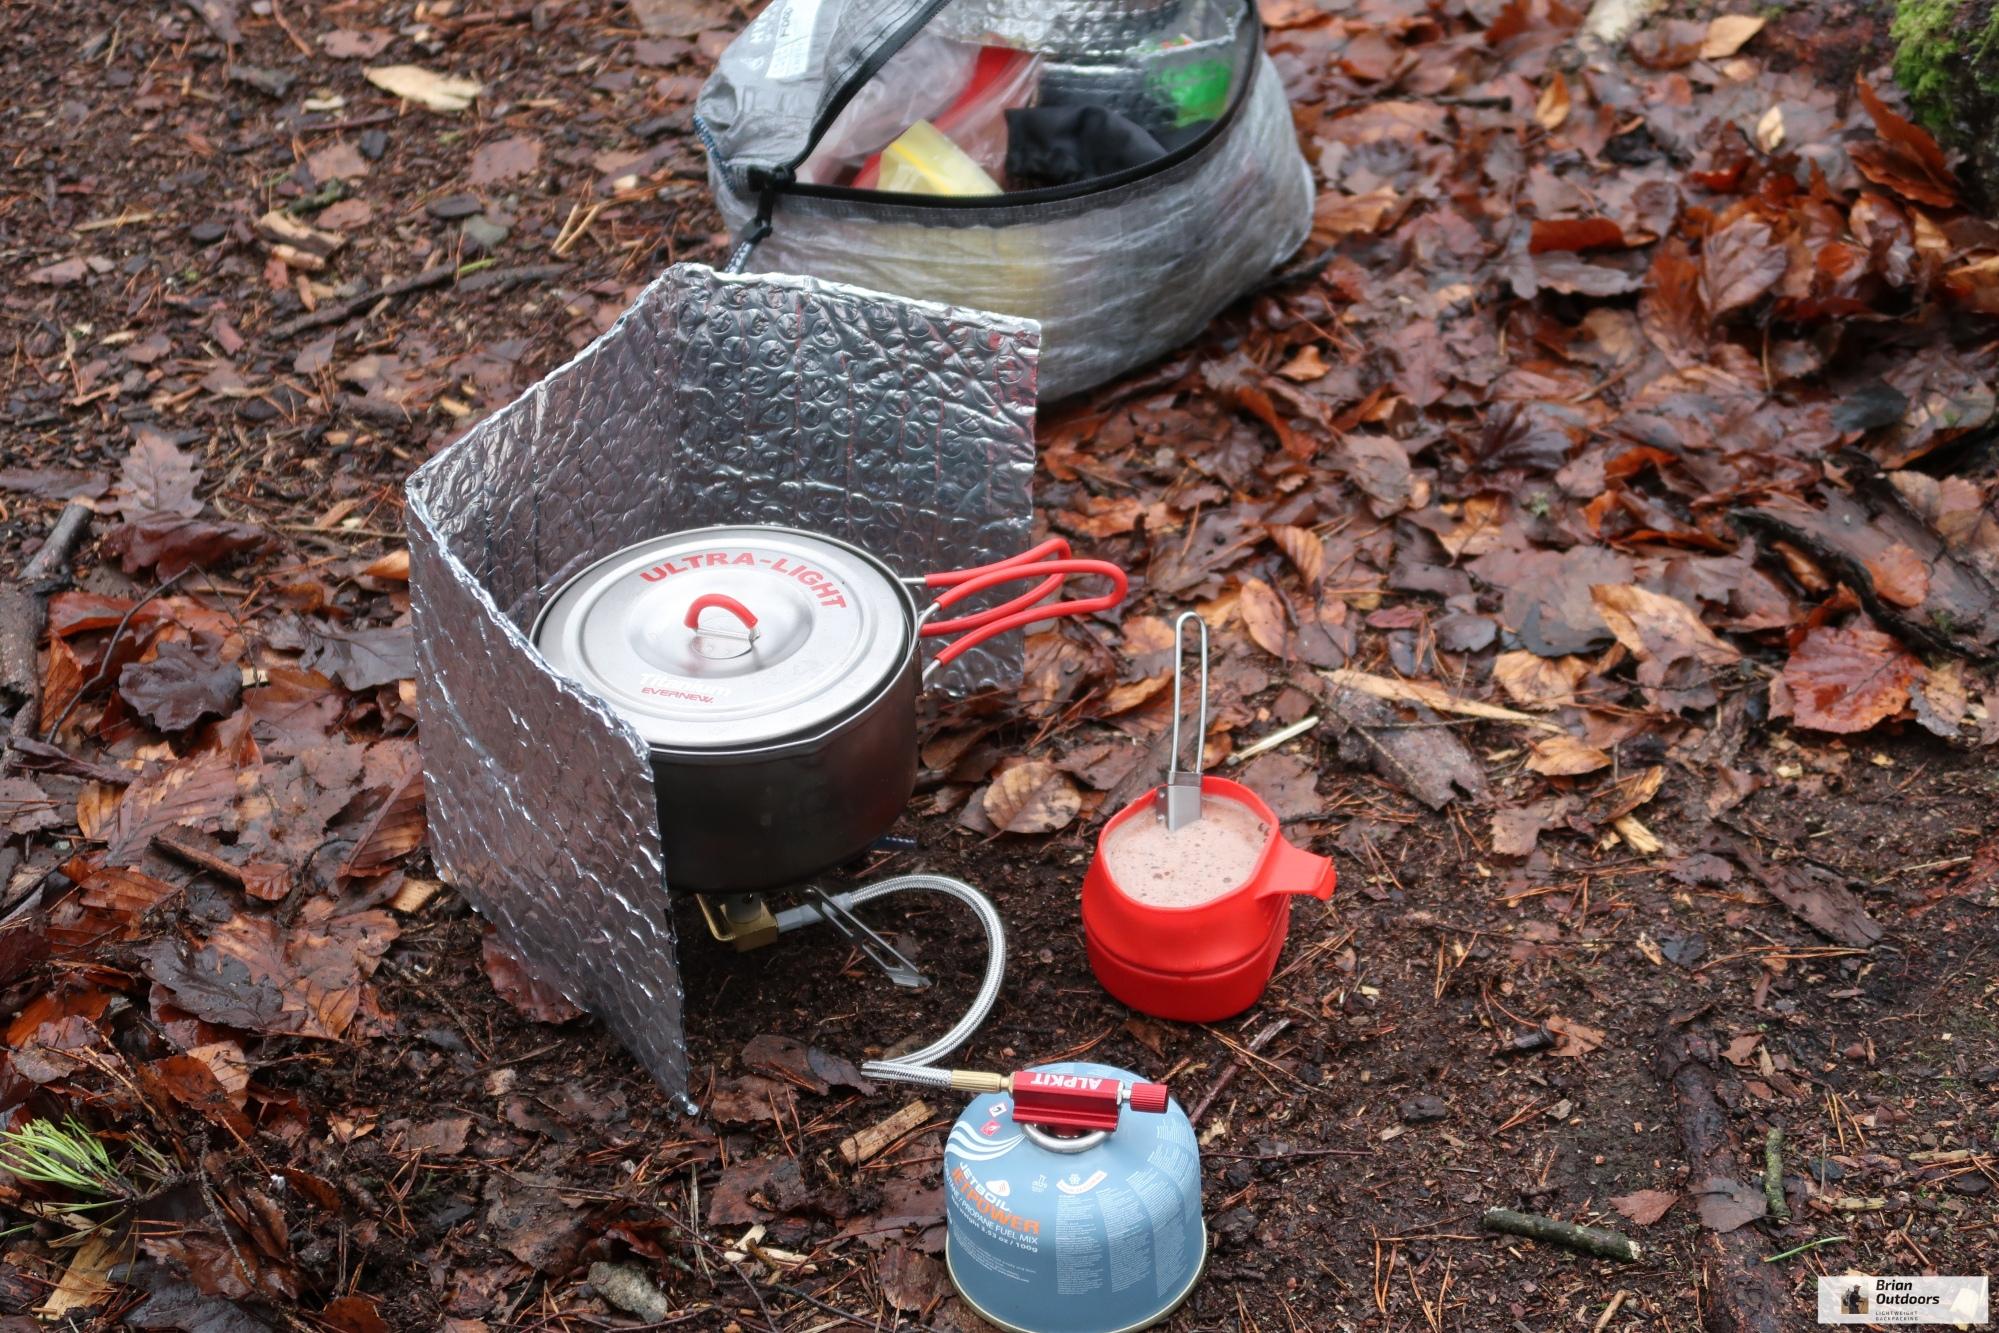 alpkit koro gas camping//hiking stove titanium mountaineering stove